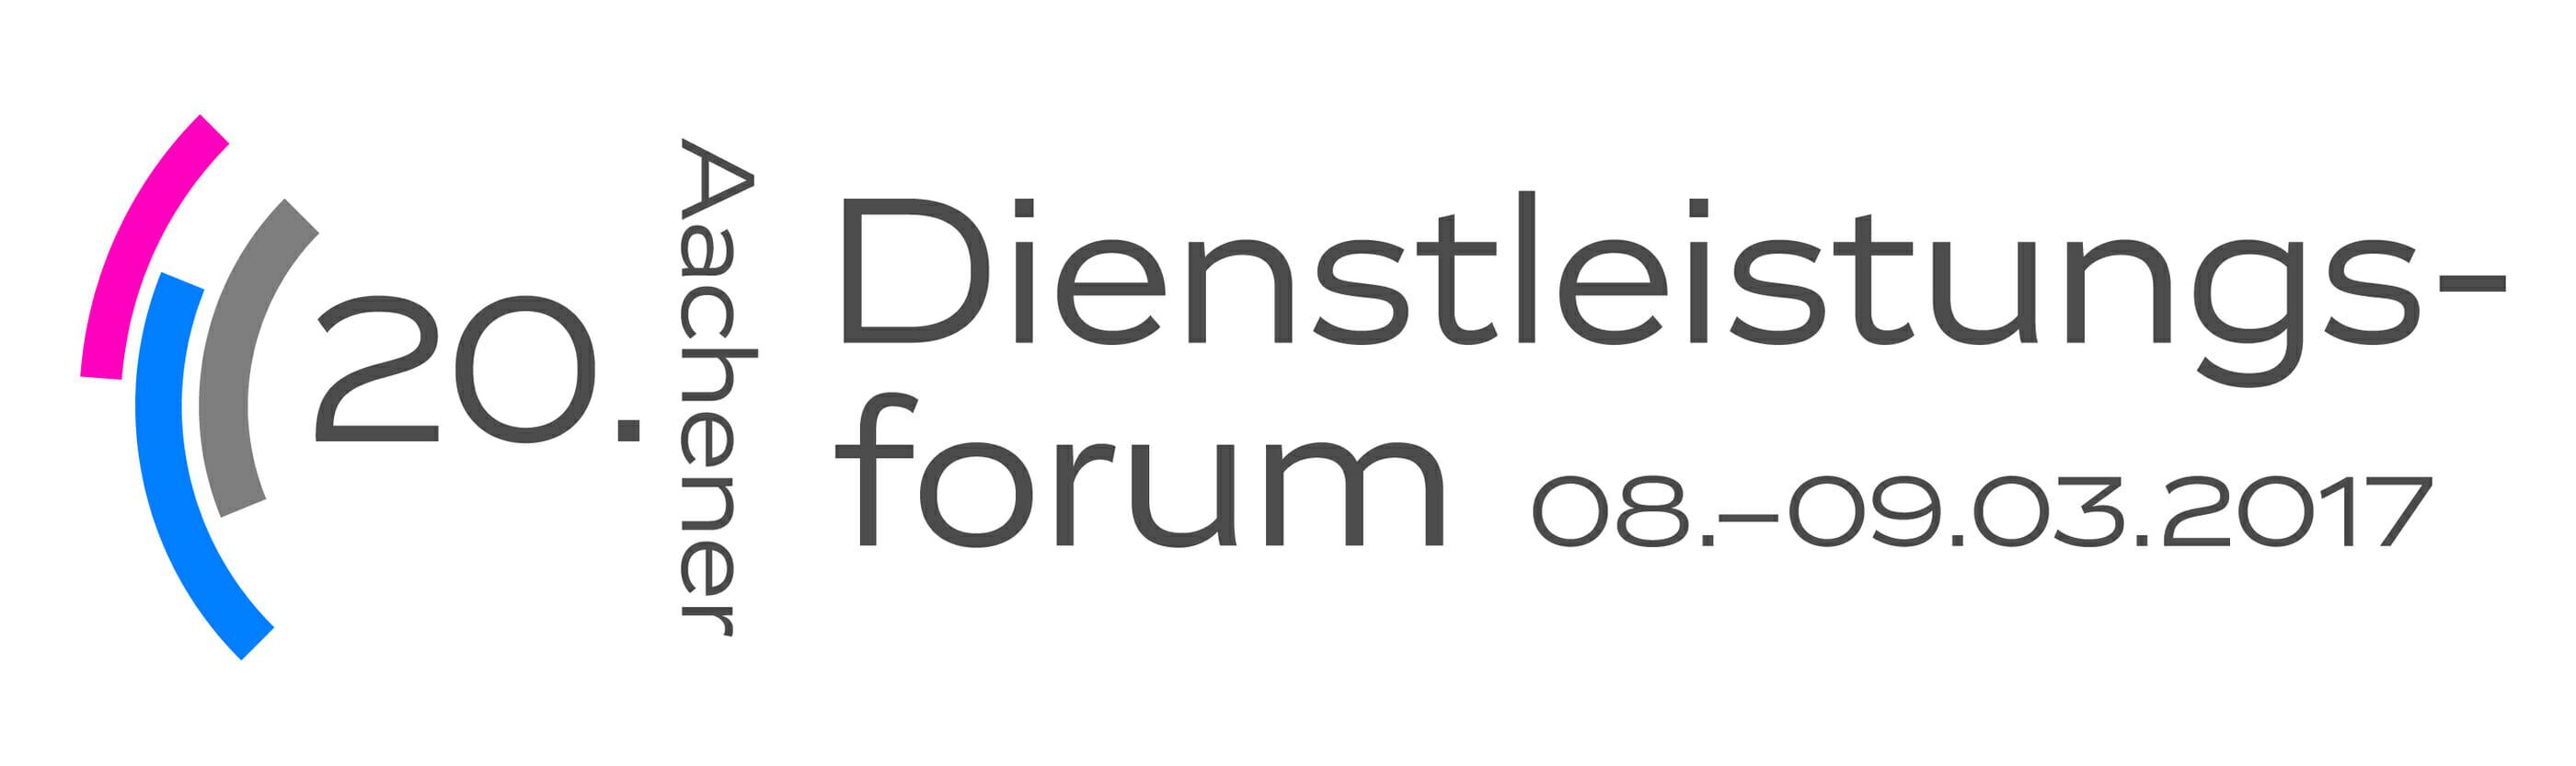 dl-forum_2017_logo